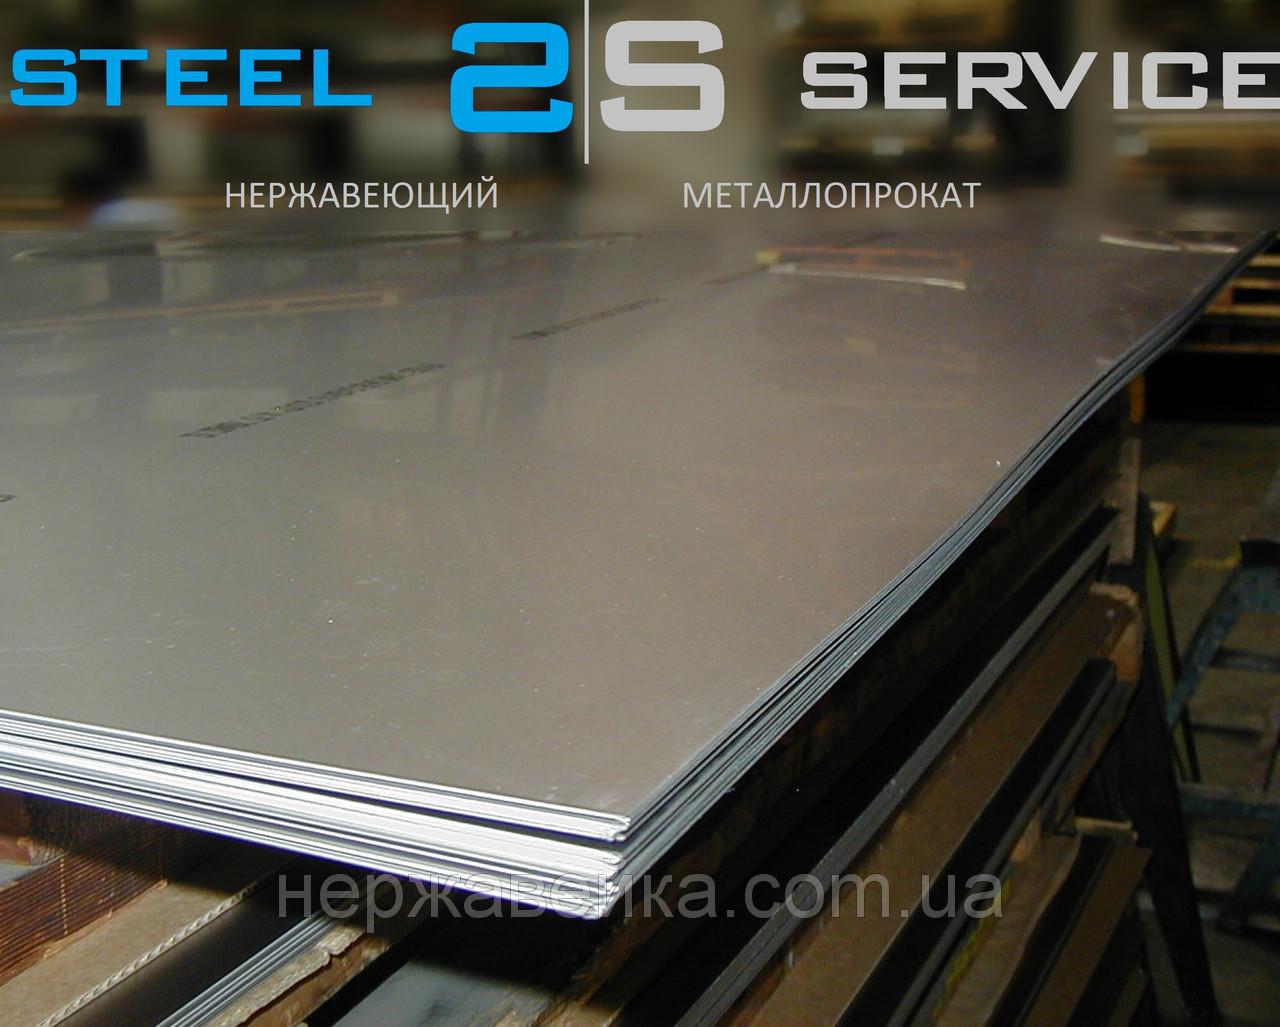 Нержавейка лист 3х1250х2500мм  AISI 321(08Х18Н10Т) 2B - матовый,  пищевой